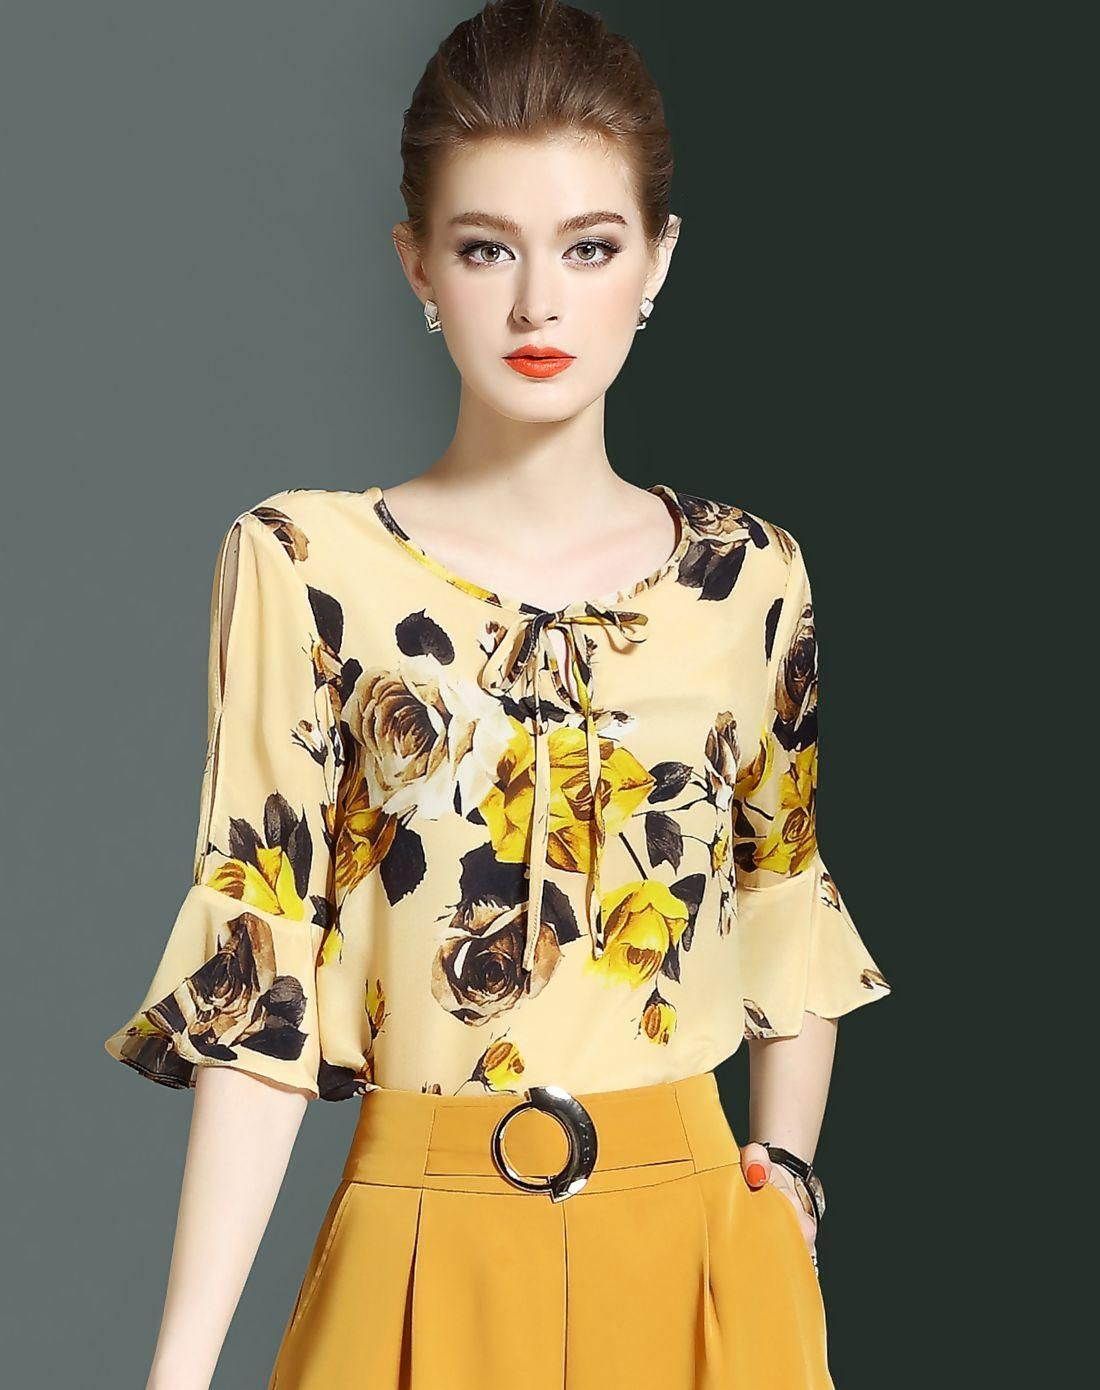 af24aa9f29 VIPme (VIPSHOP Global) - LONYUASH Light Yellow Silk Floral Bell Half Sleeve  Top - AdoreWe.com